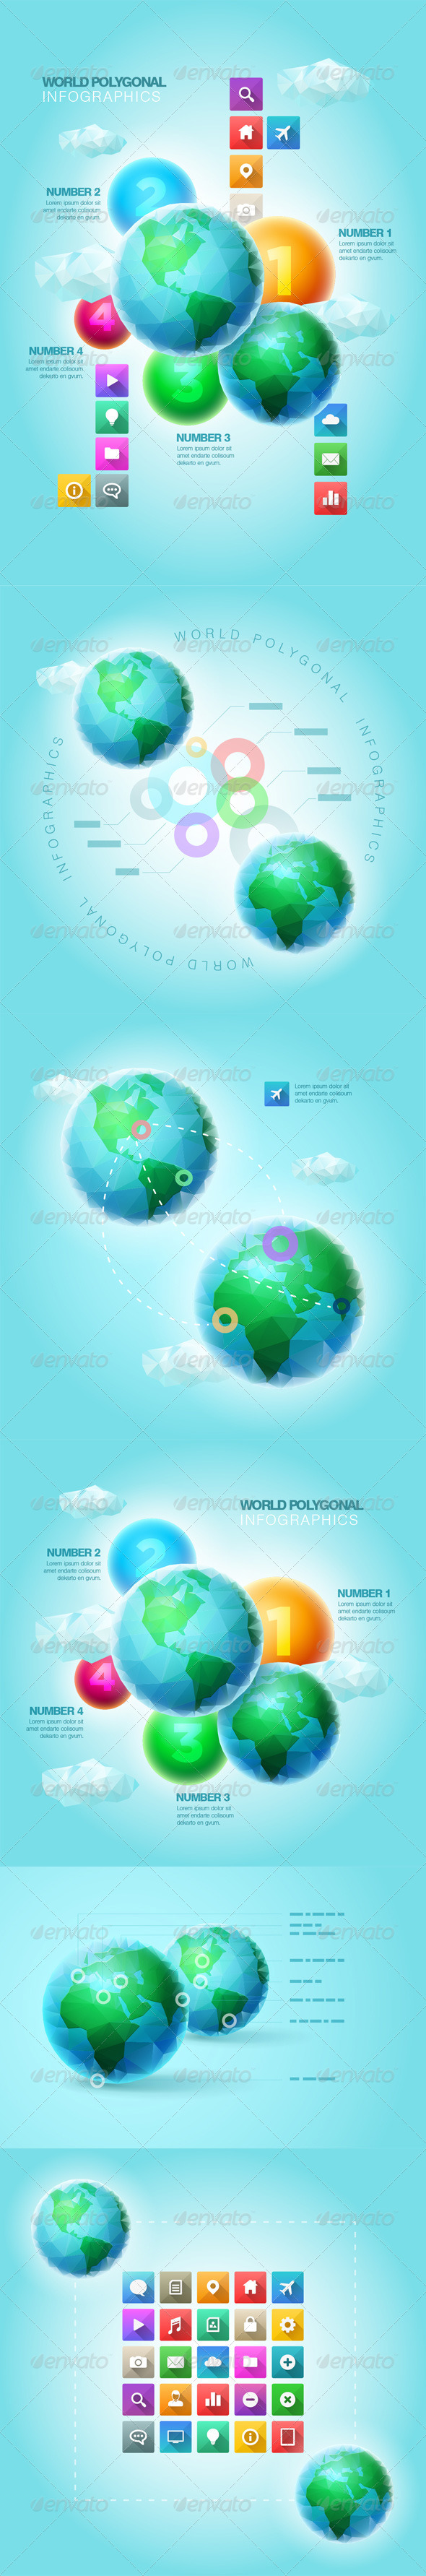 Polygonal World Infographic Template Set - Infographics